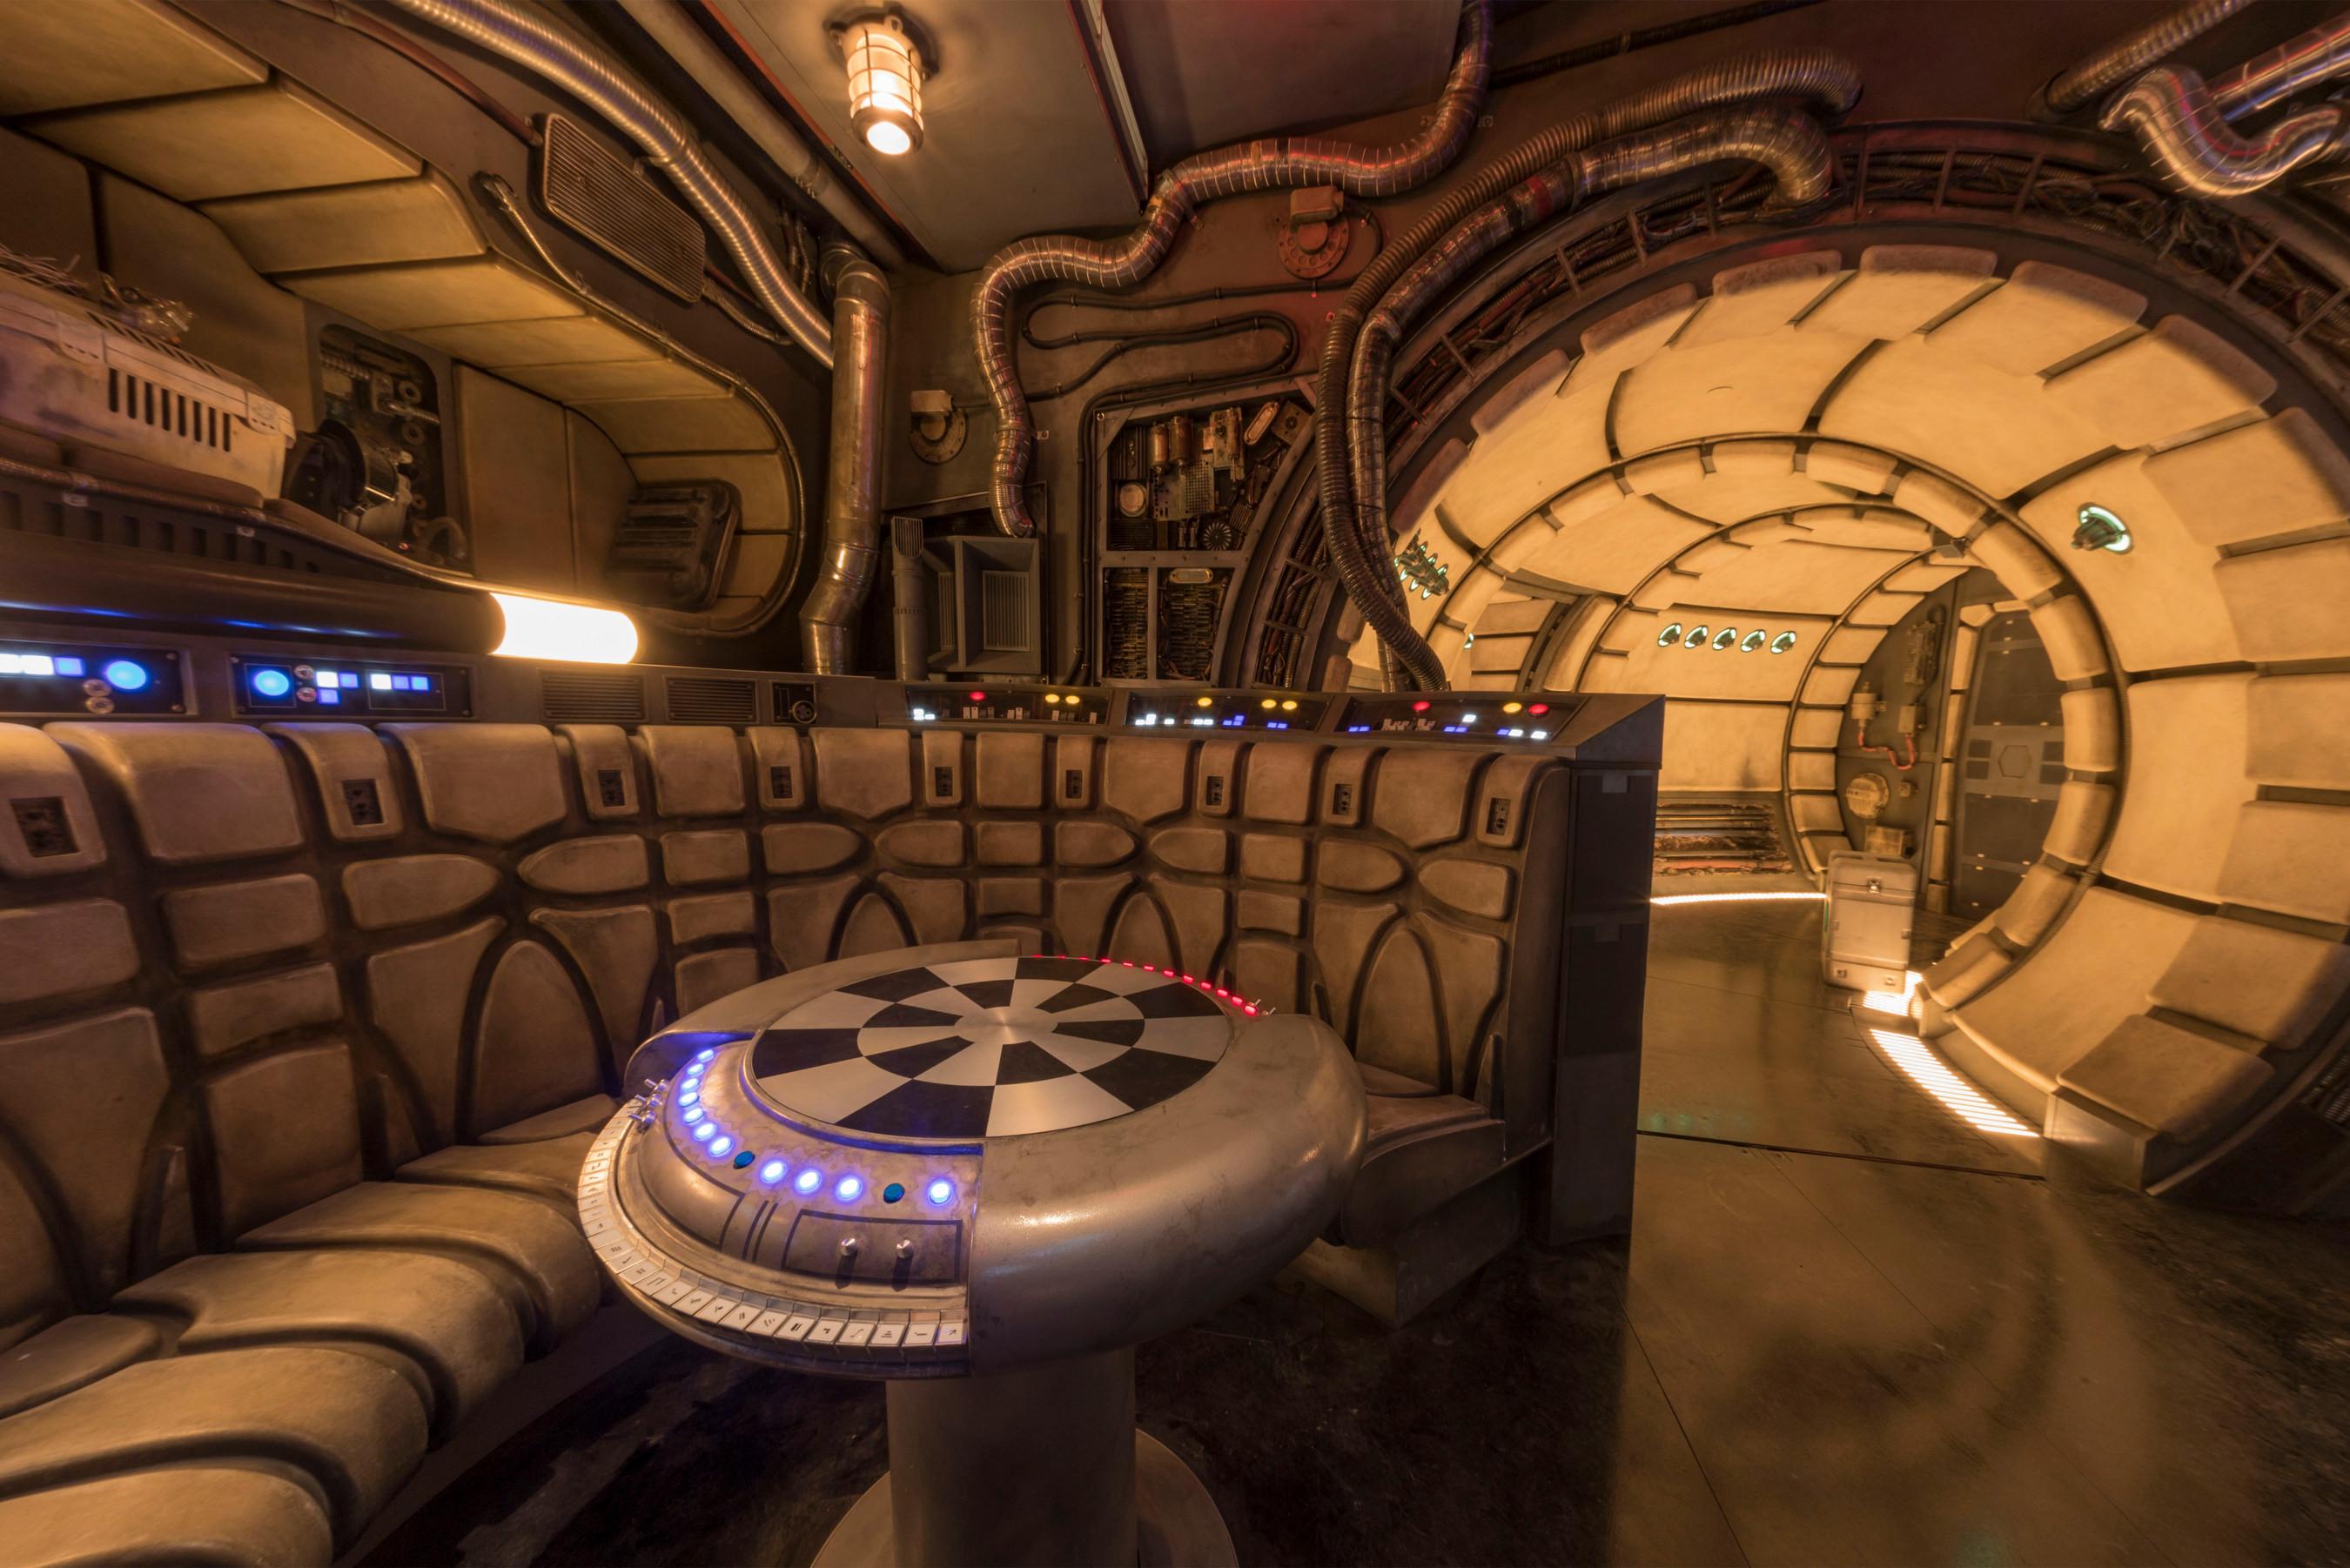 Star Wars: GalaxyÕs Edge Ð Chess Room in Millennium Falcon: Smugglers Run -  Márcia Travessoni - Eventos, Lifestyle, Moda, Viagens e mais